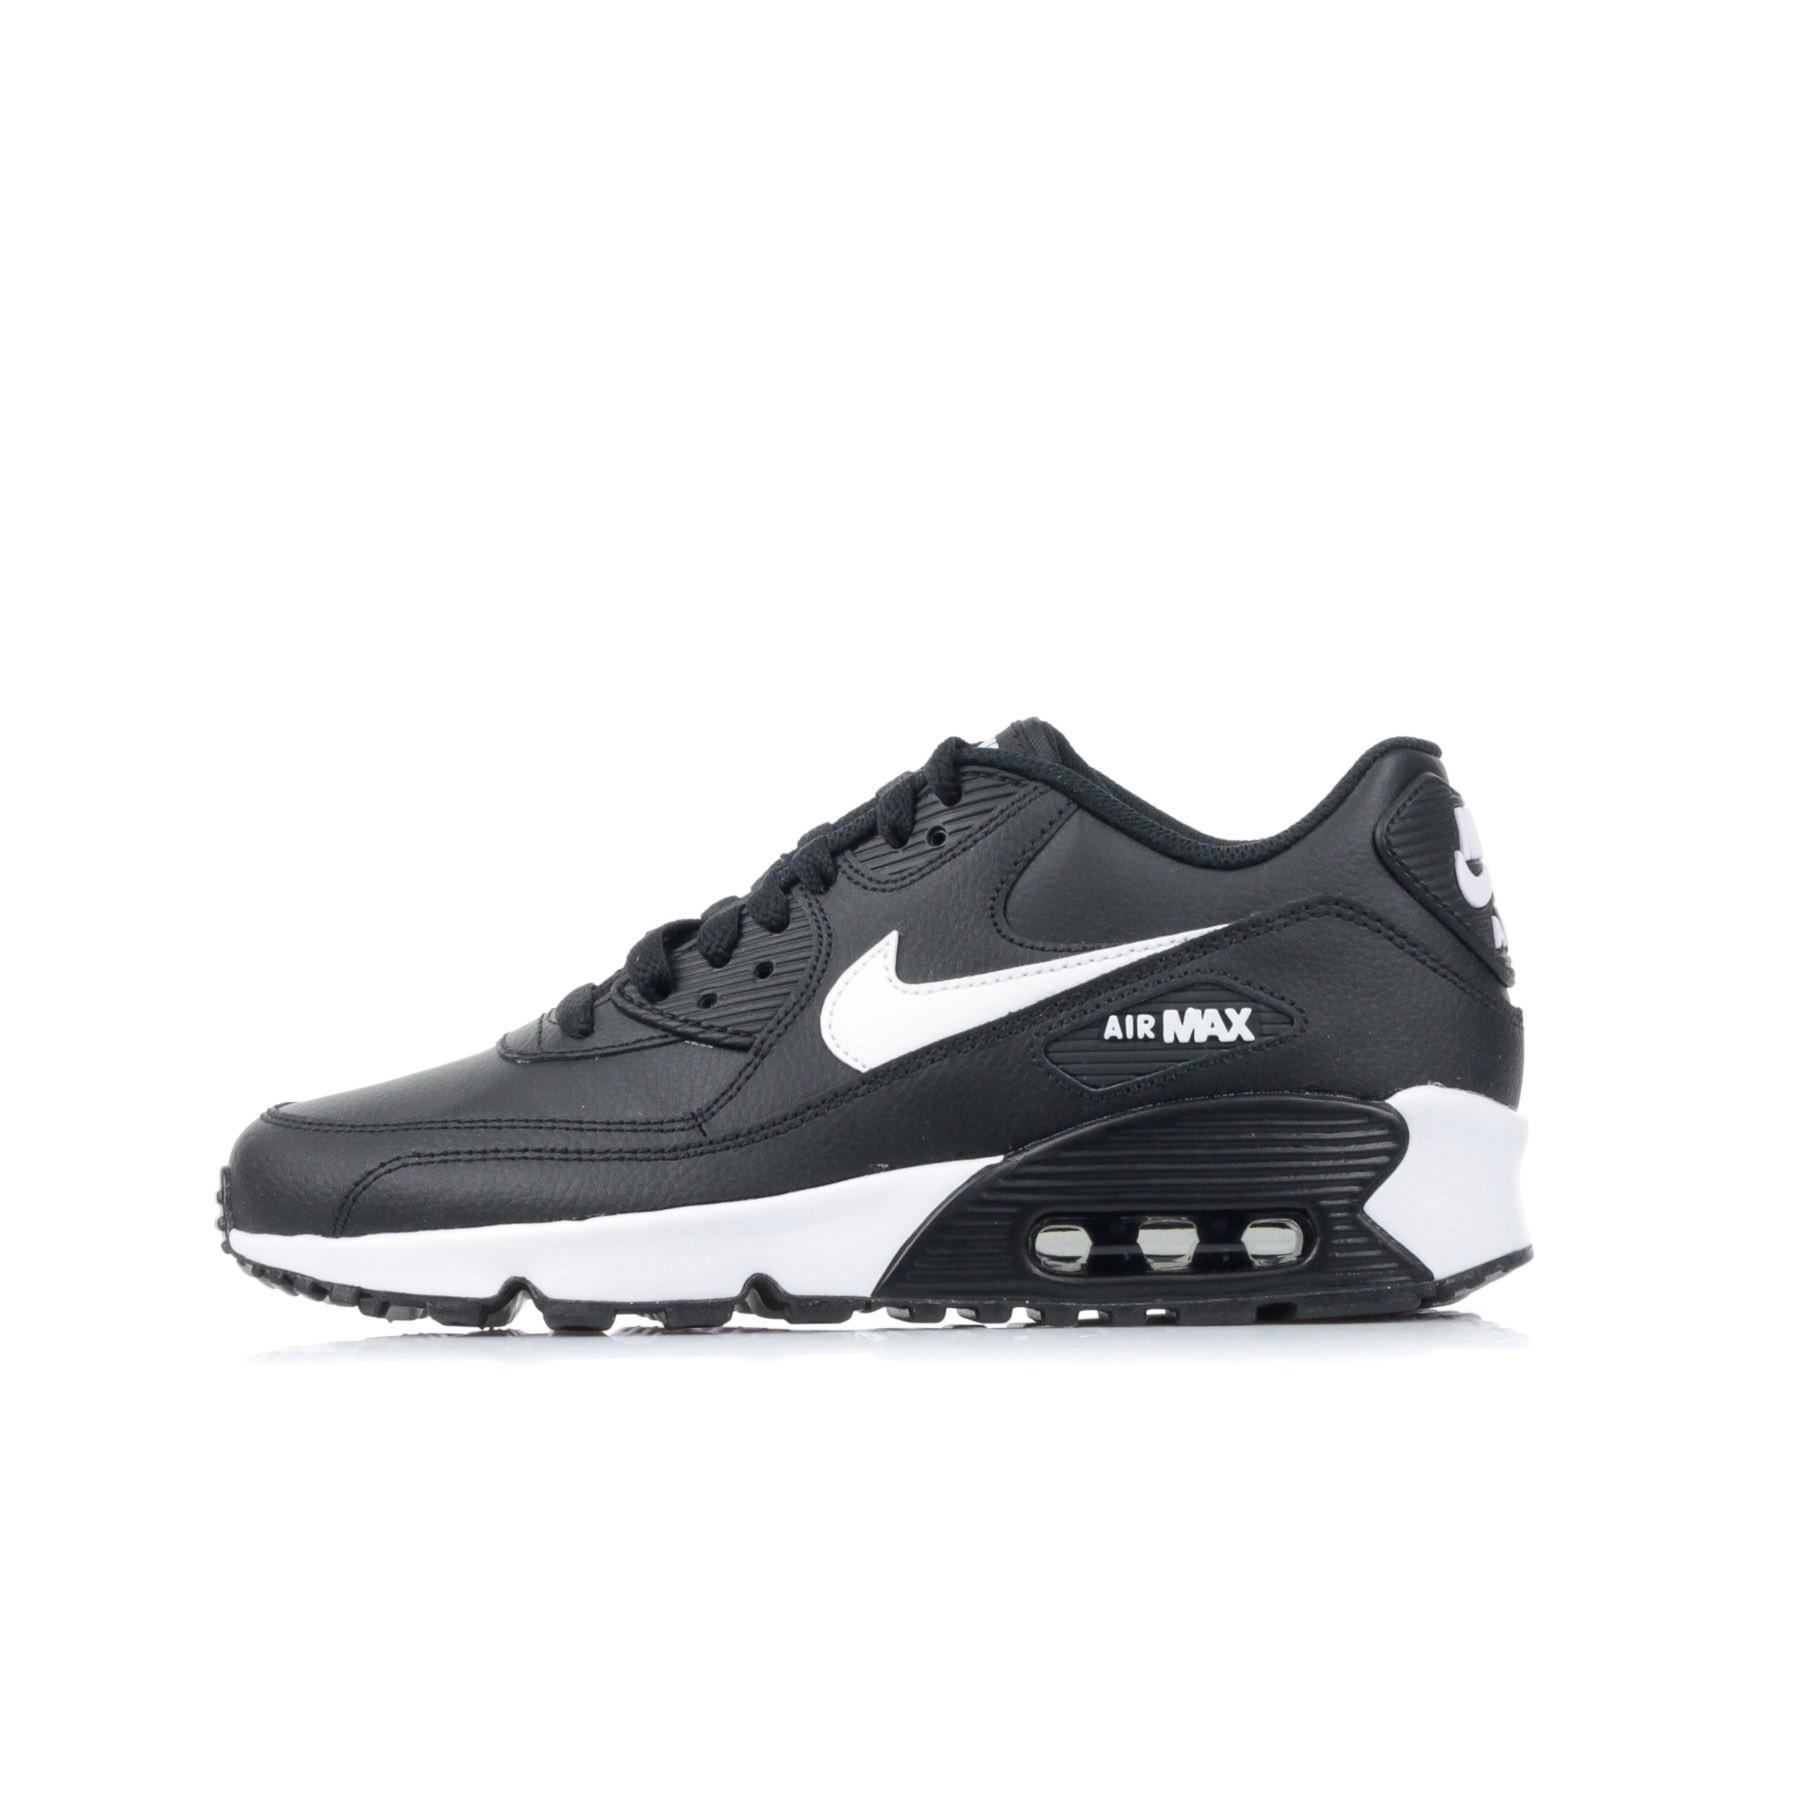 Nike Scarpa bassa bambino air max 90 leather 833412-025 | Atipicish...